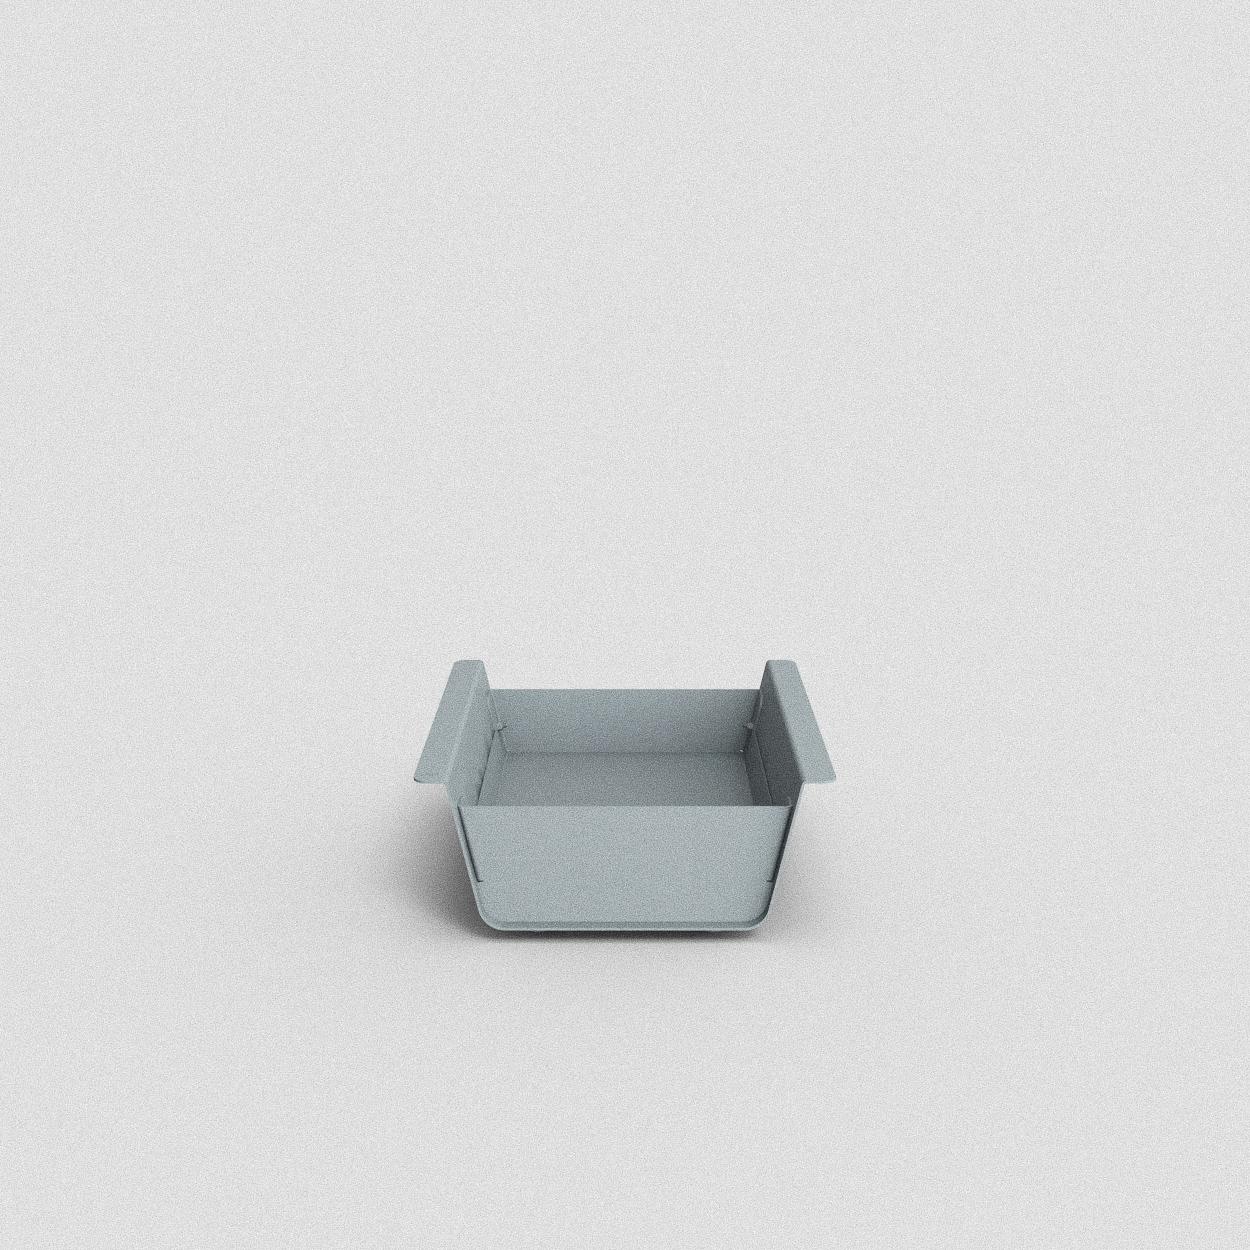 26L / Standardfärg: Granit